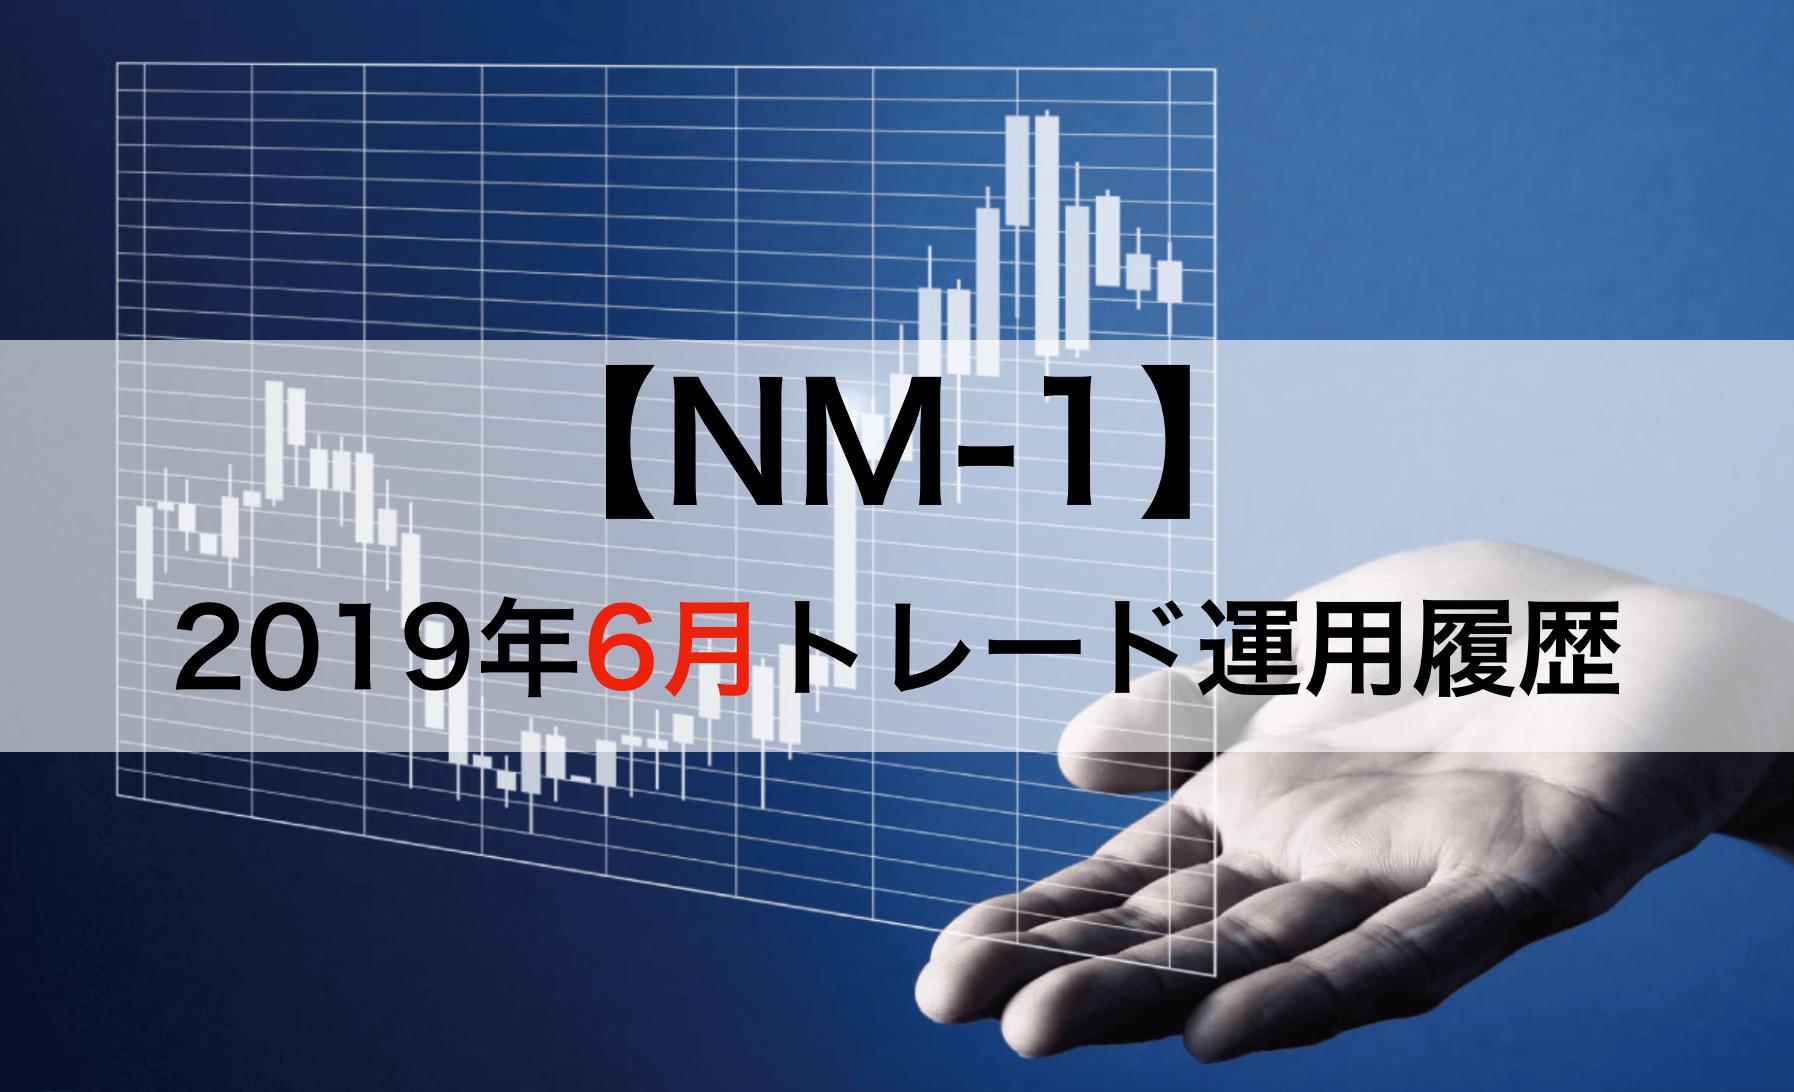 2019年6月のnm1自動売買結果